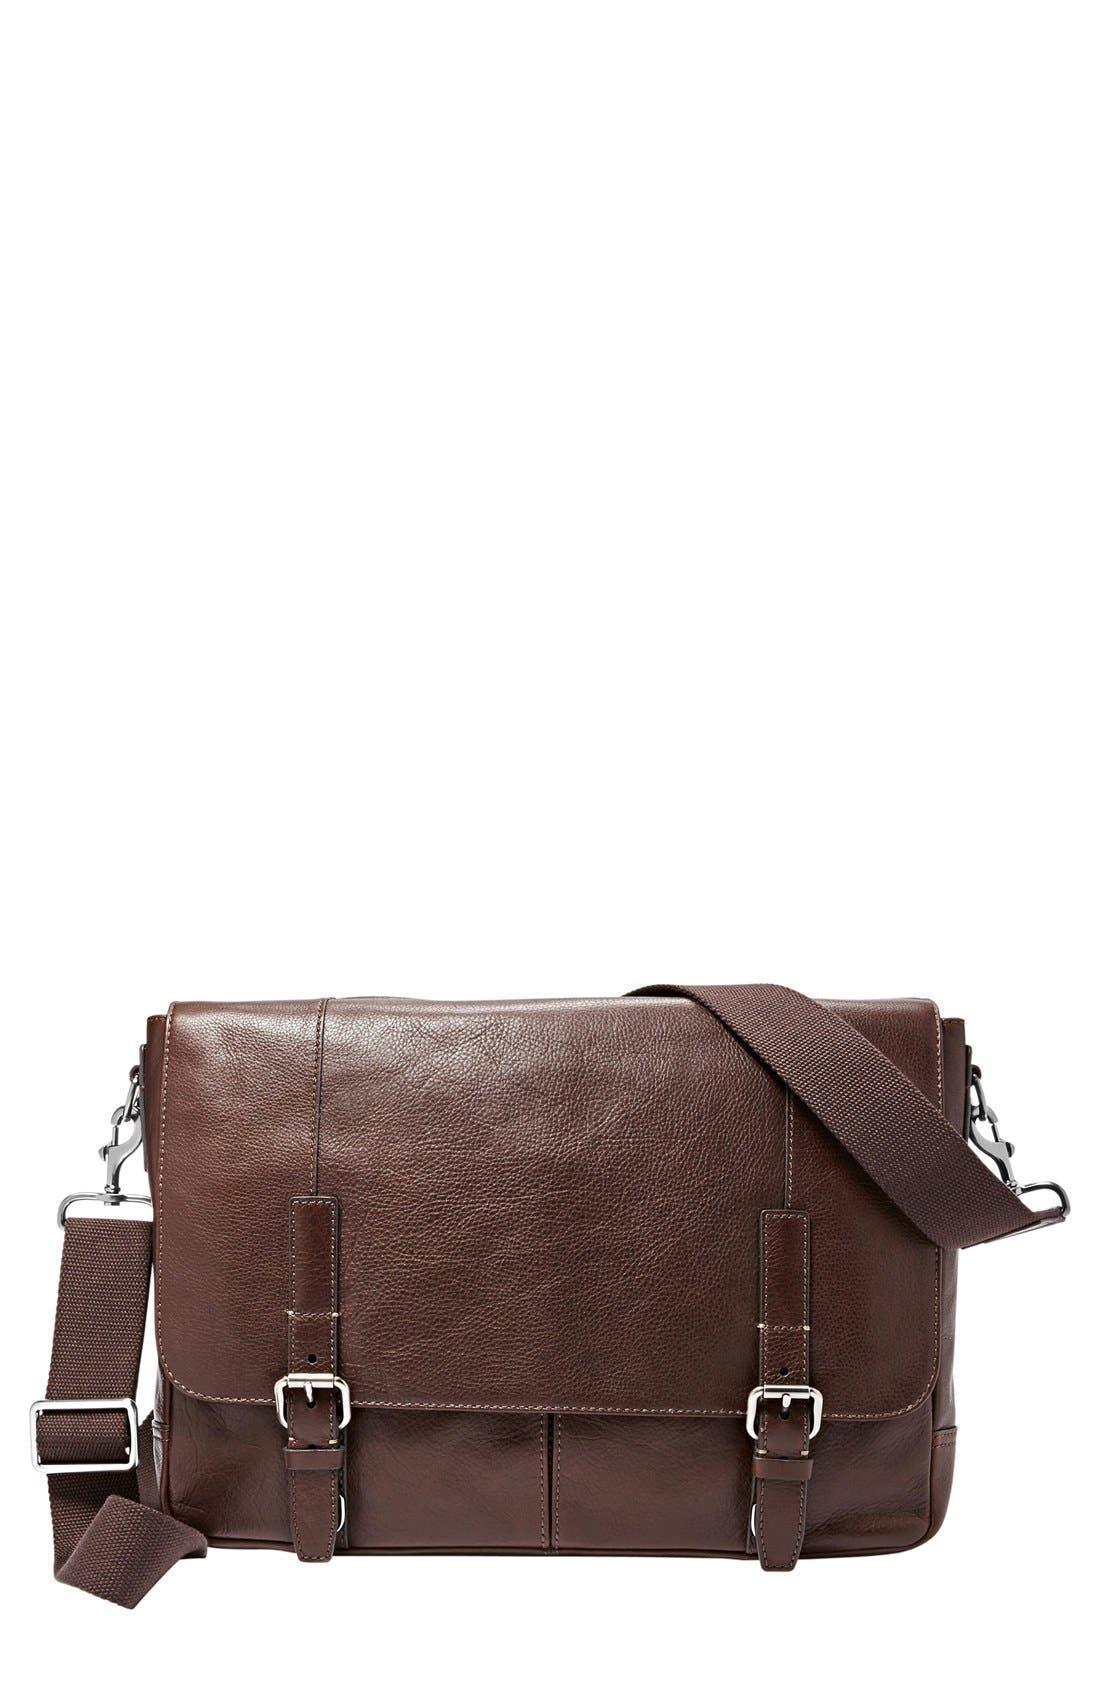 'Graham' Leather Messenger Bag,                             Main thumbnail 1, color,                             201